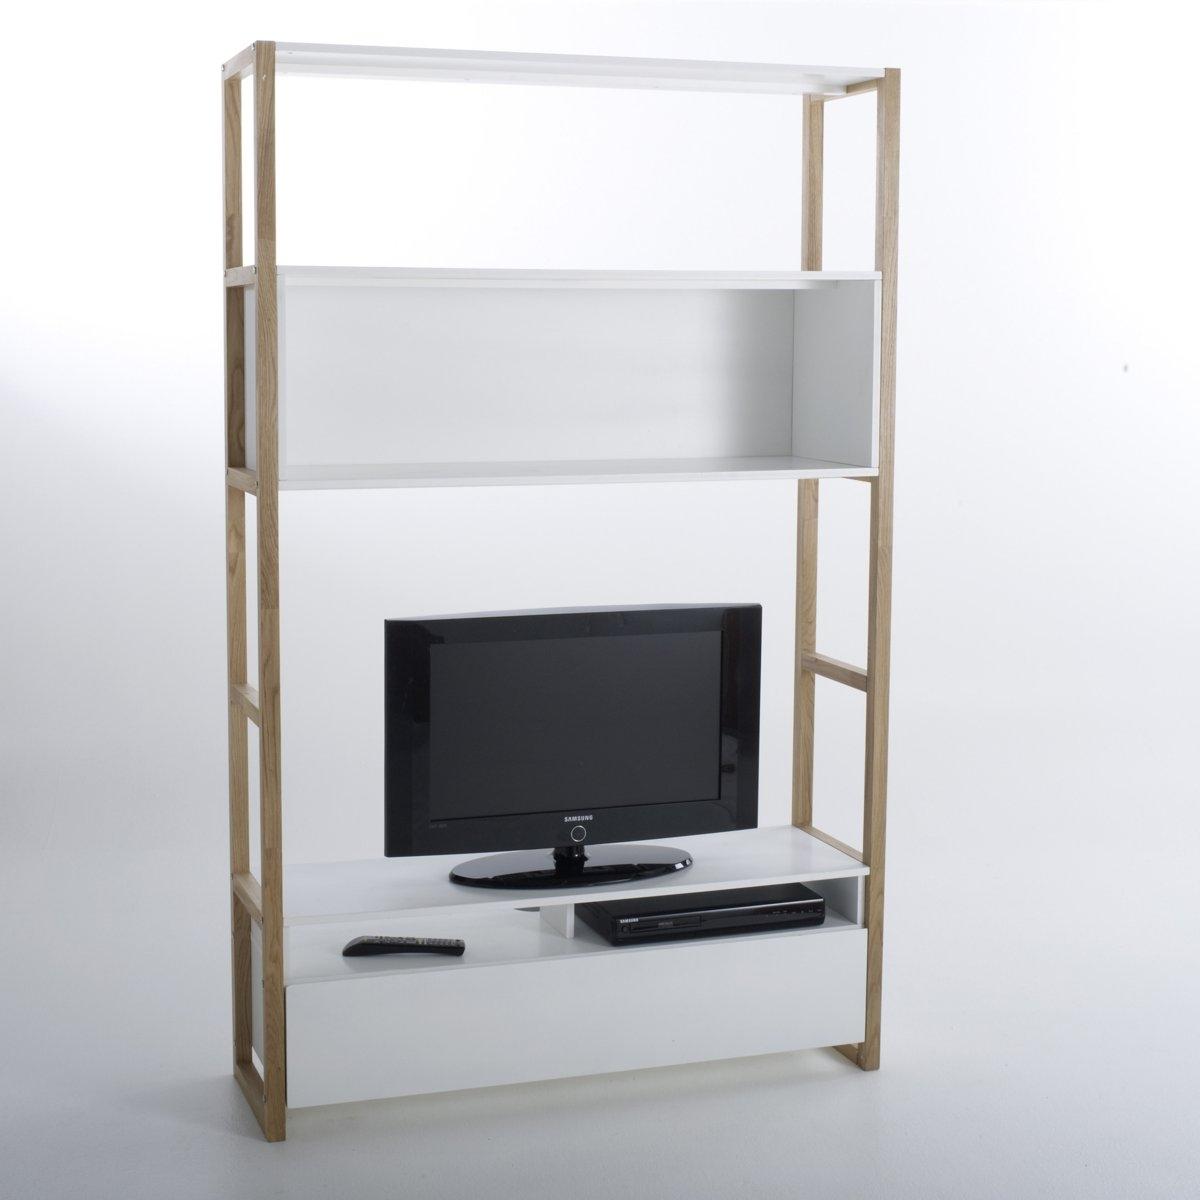 Этажерка для телевизора Compo